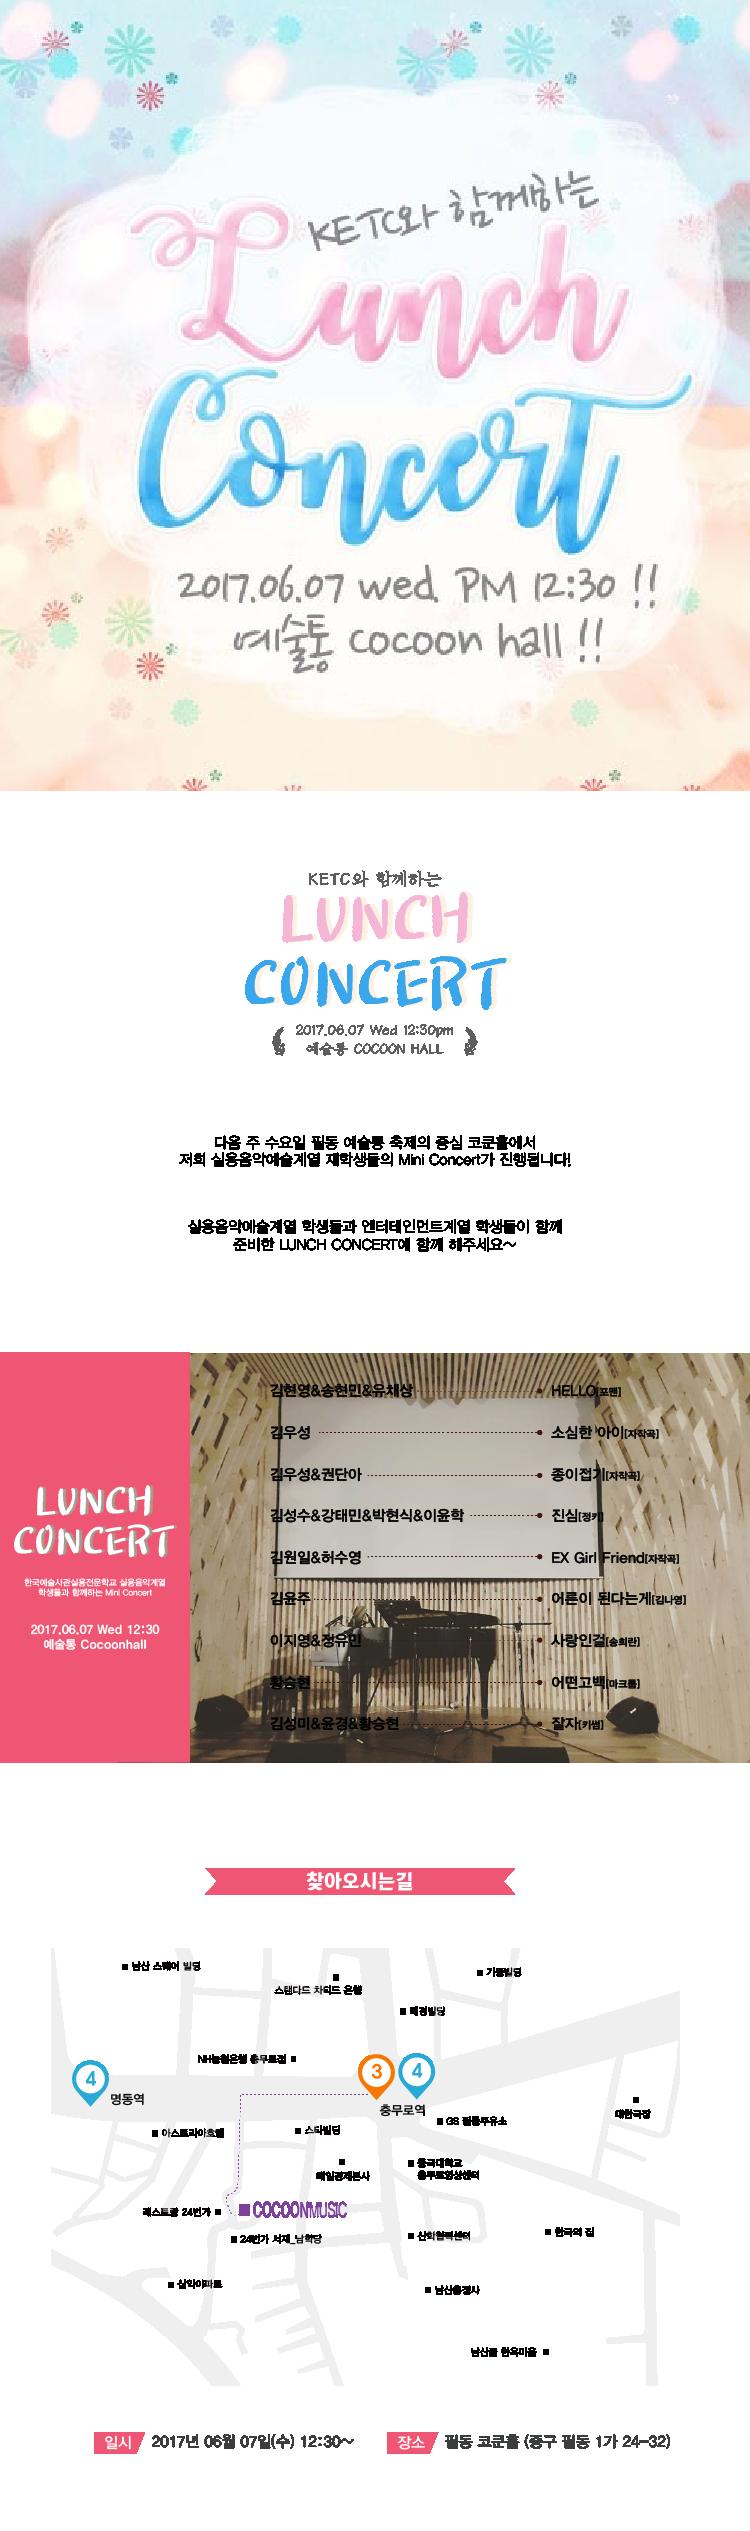 KETC와 함께하는 LUNCH CONCERT!